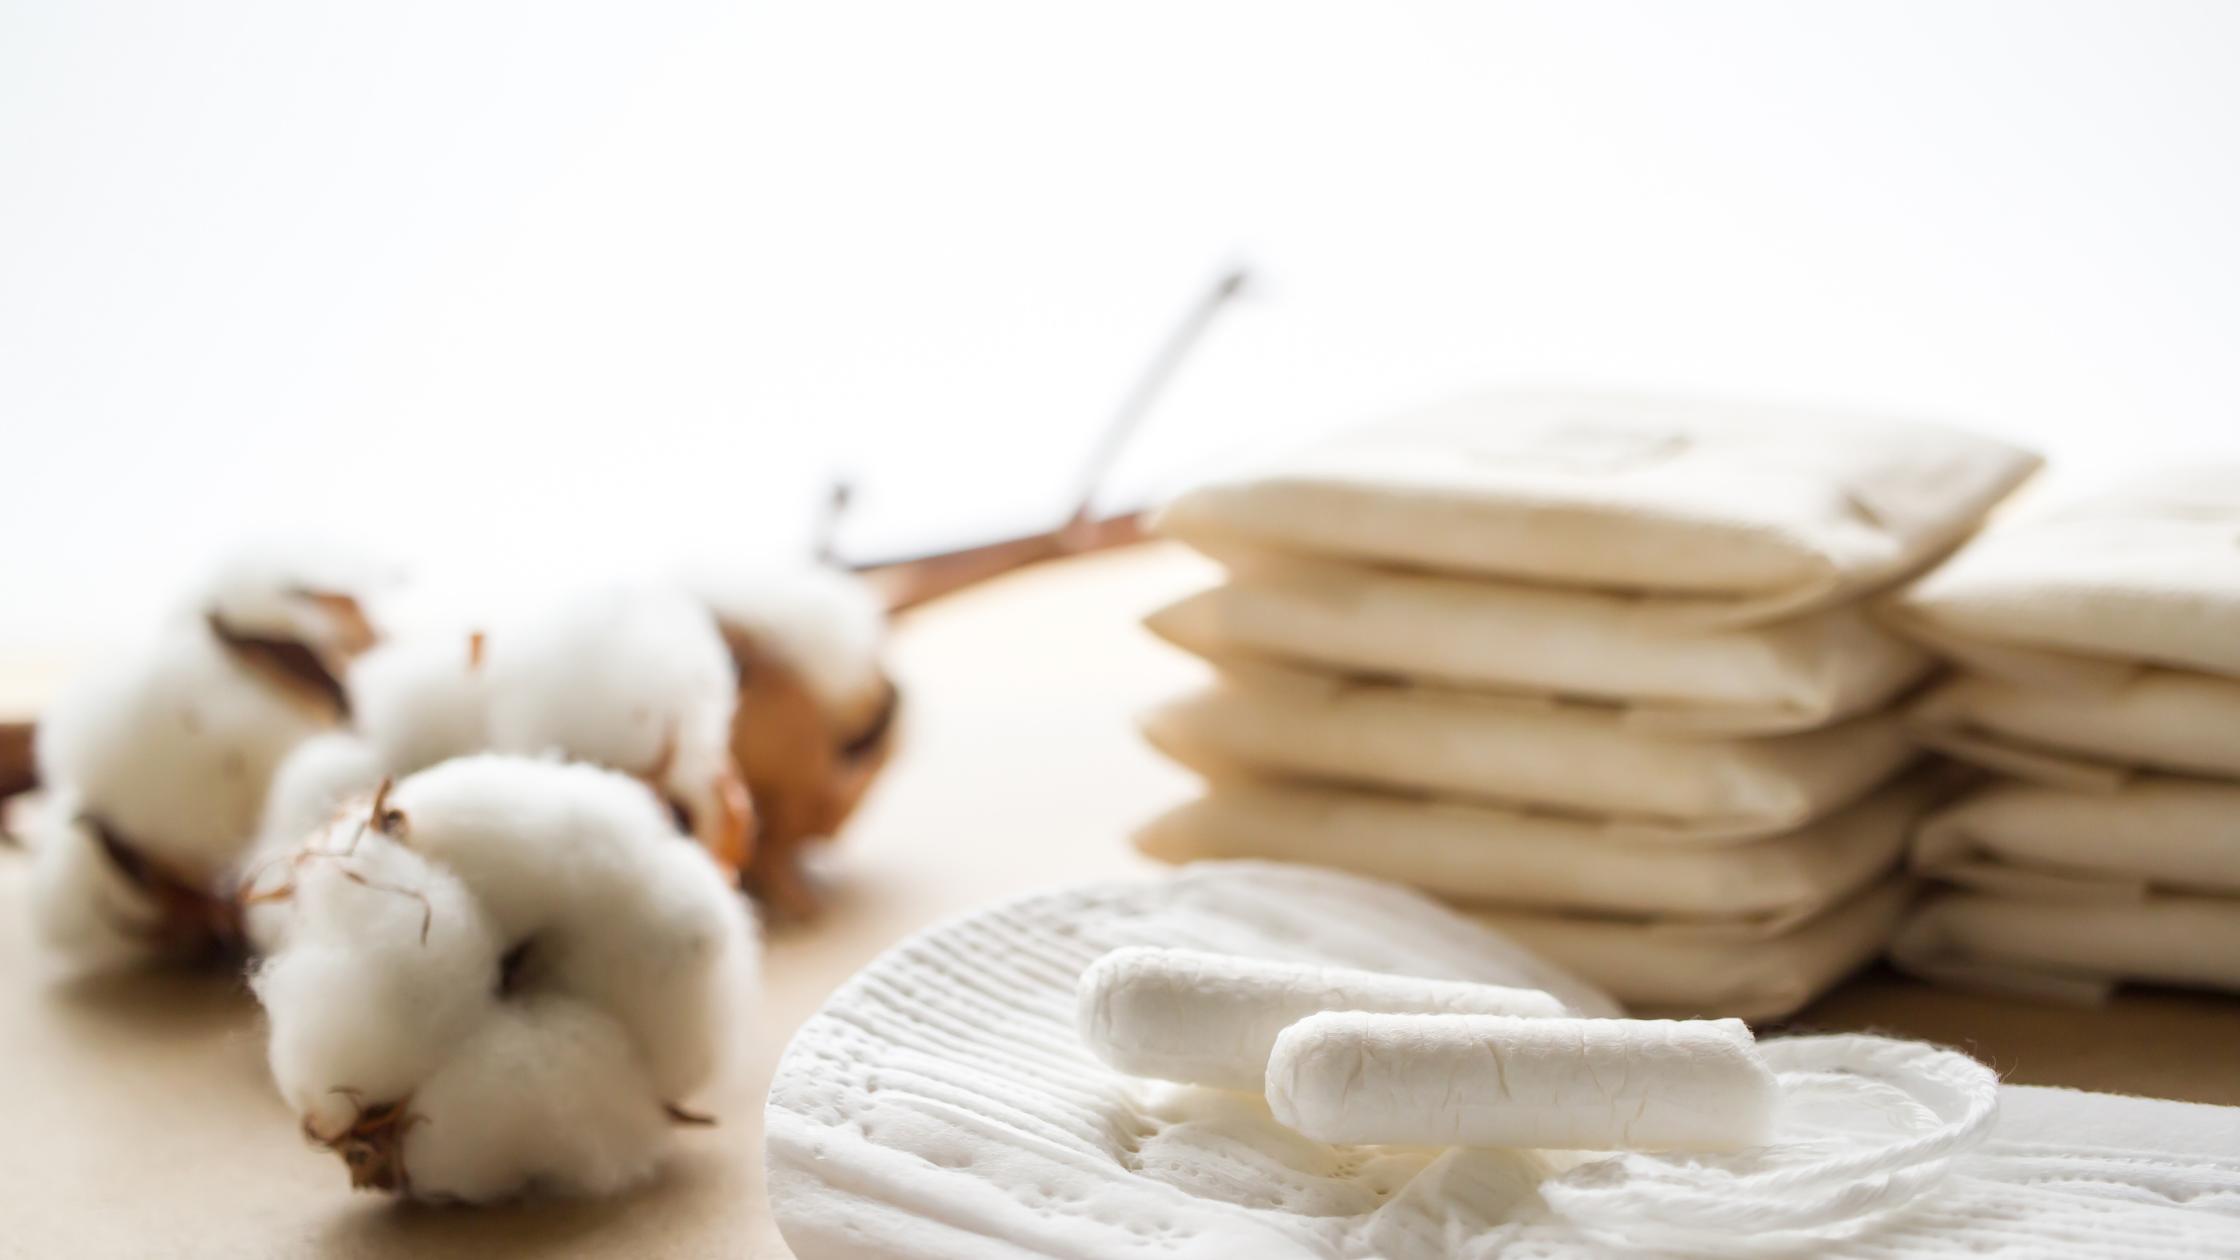 Menstrual Waste Management